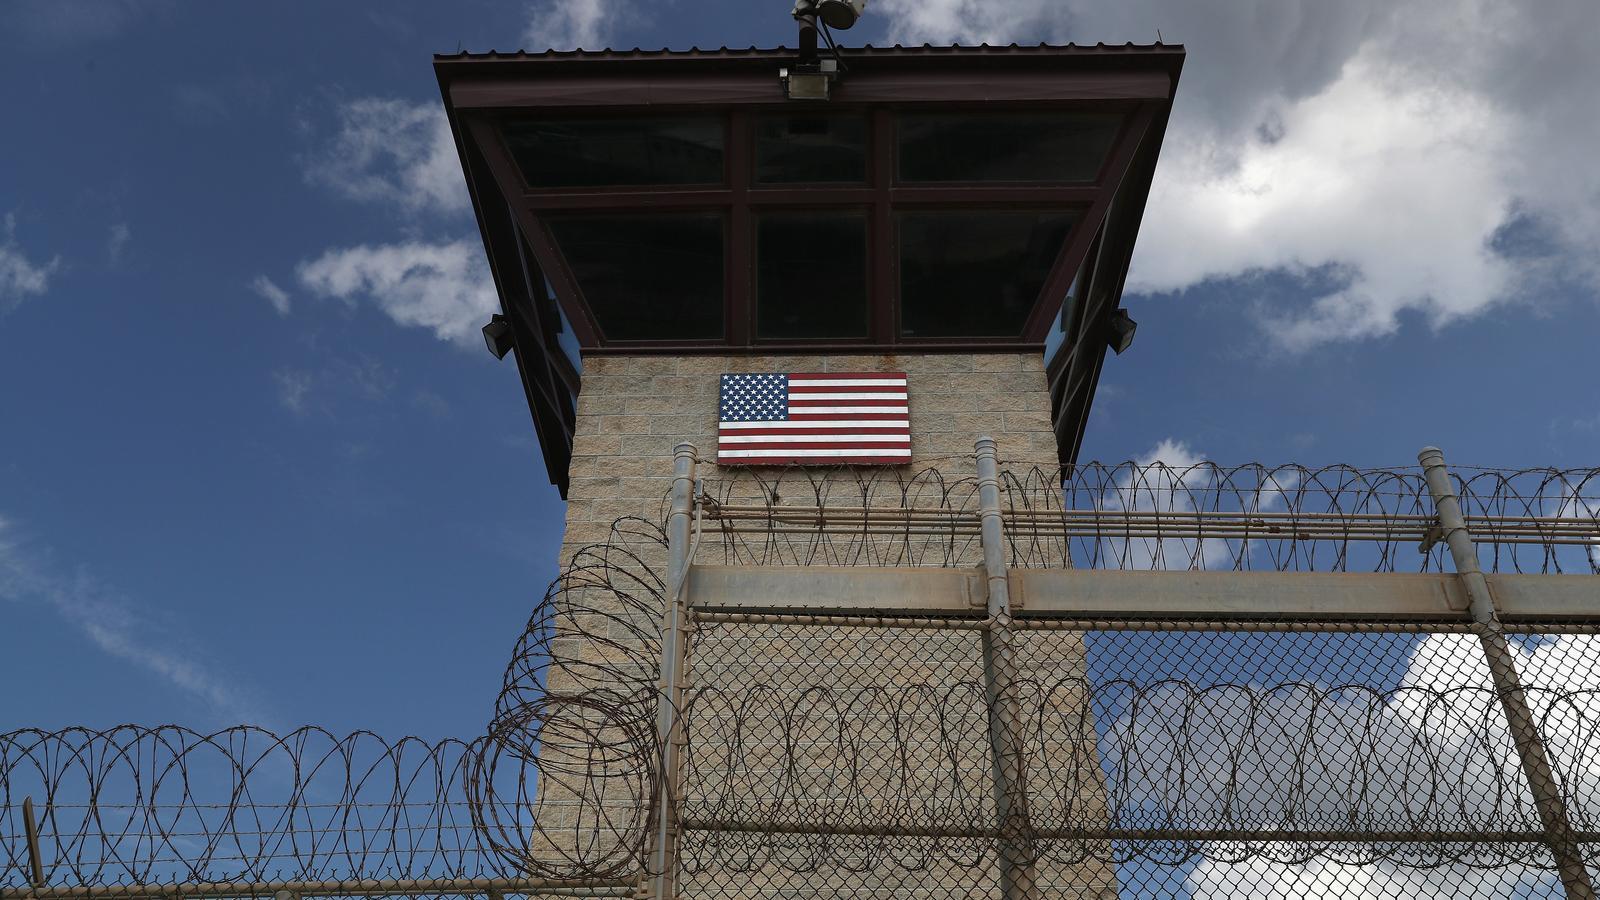 Preso de Guantanamo